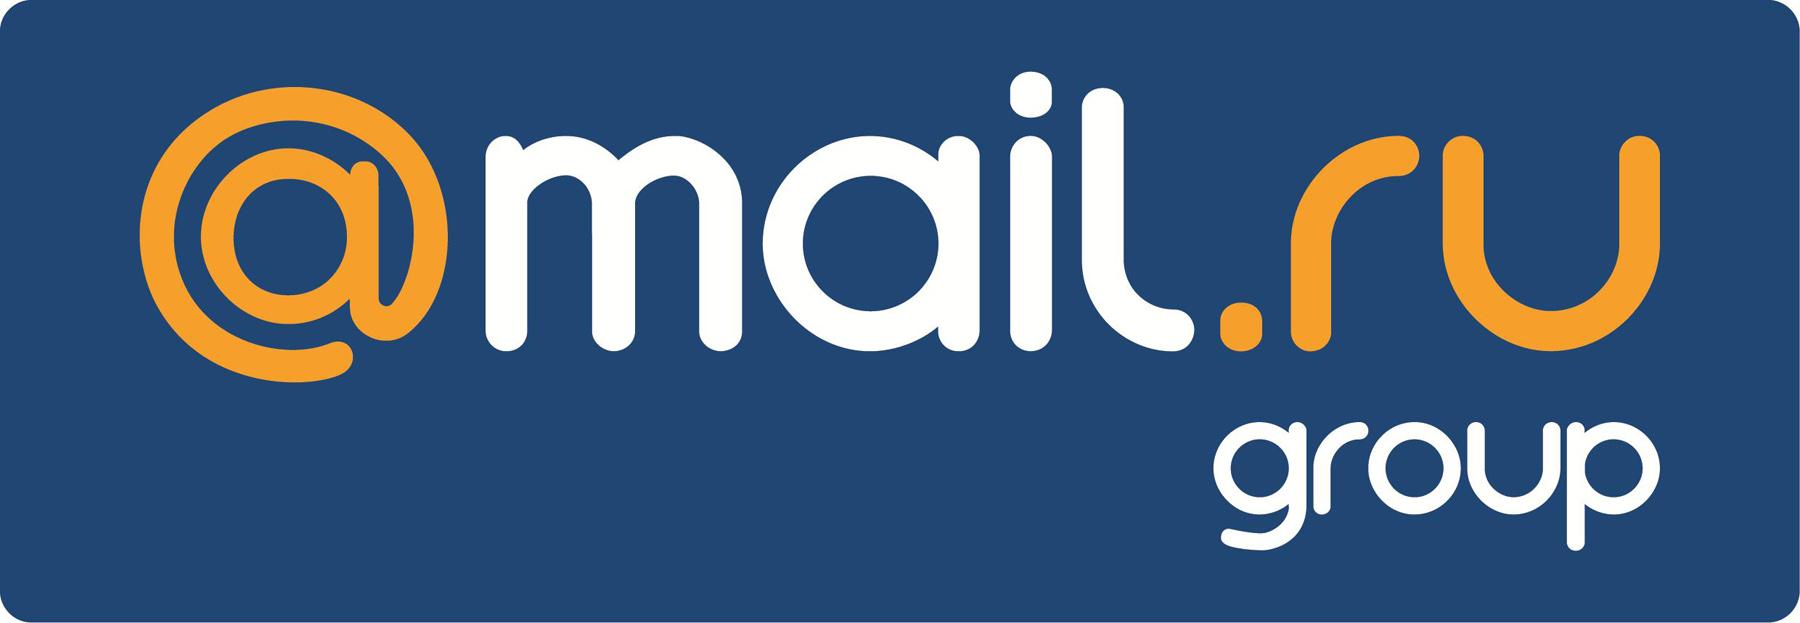 mail-ru-group.jpg